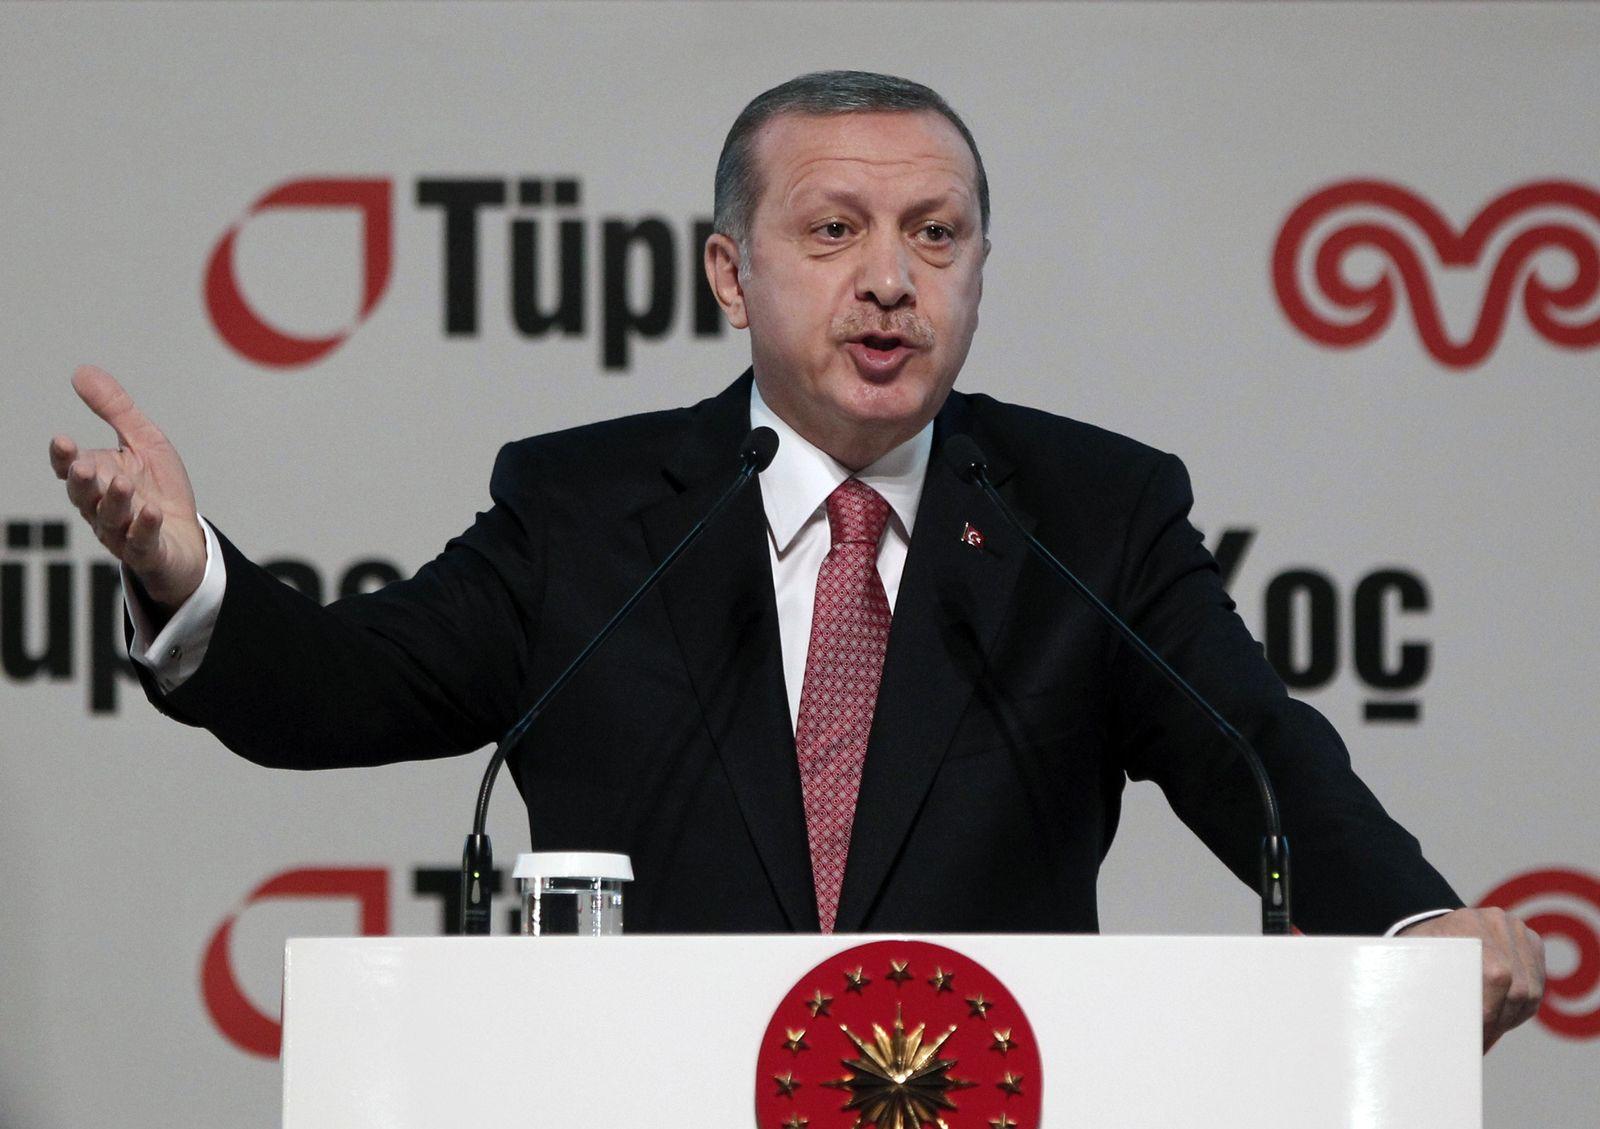 TURKEY-MEDIA/